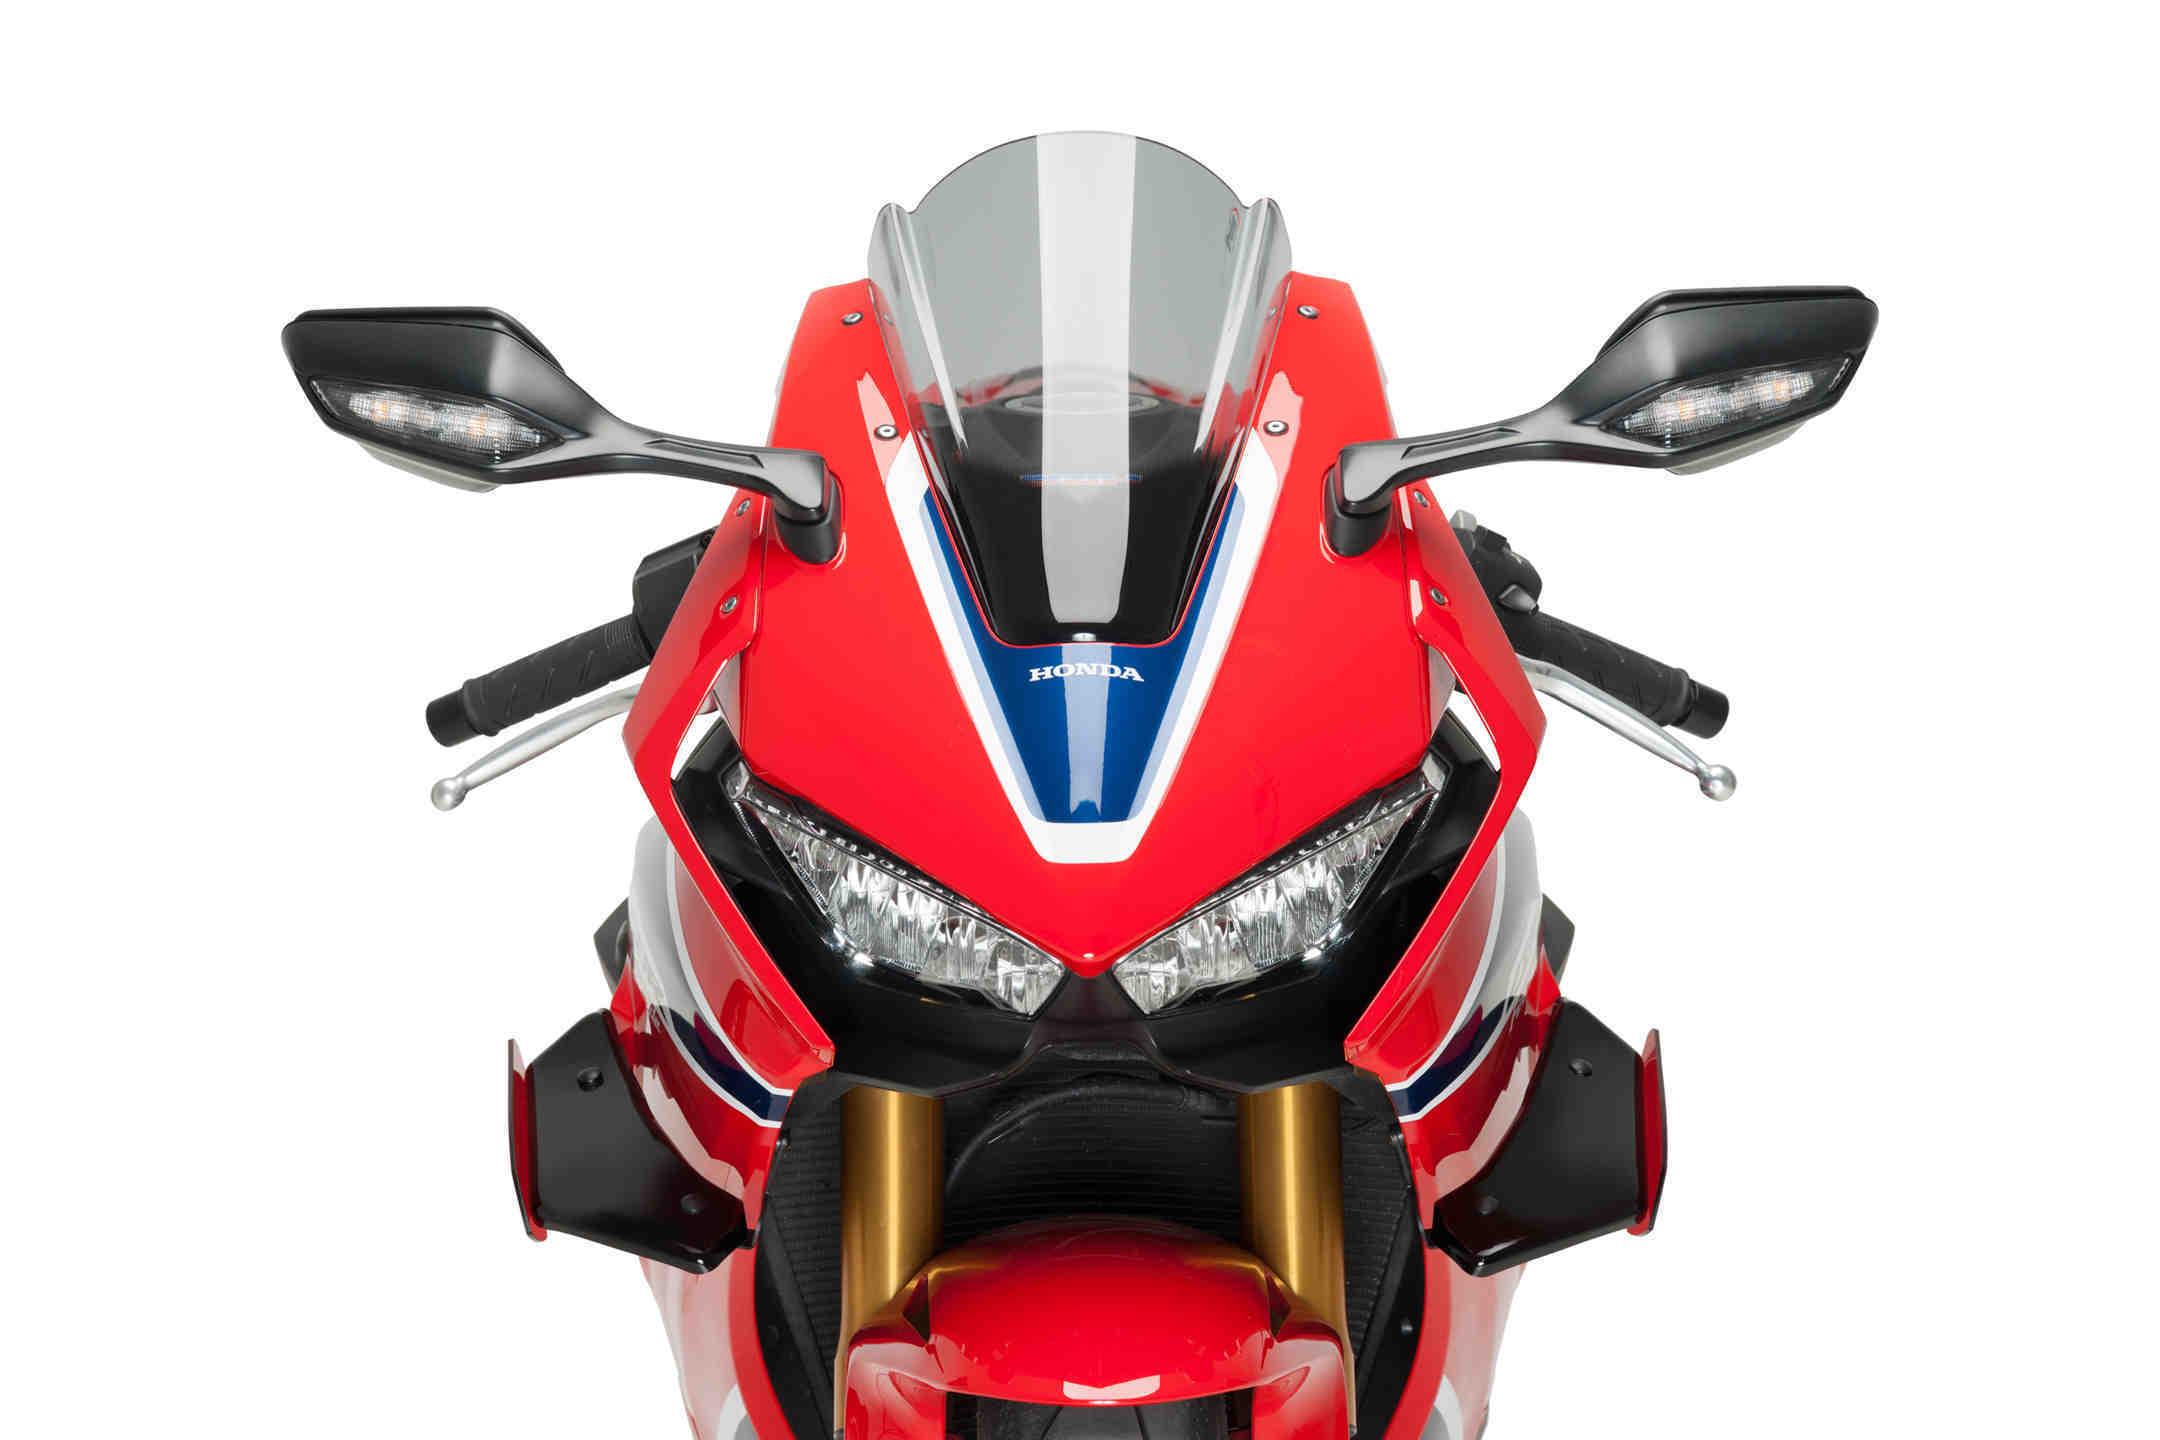 Alerón lateral Downforce puig para Honda CBR1000RR 17-18